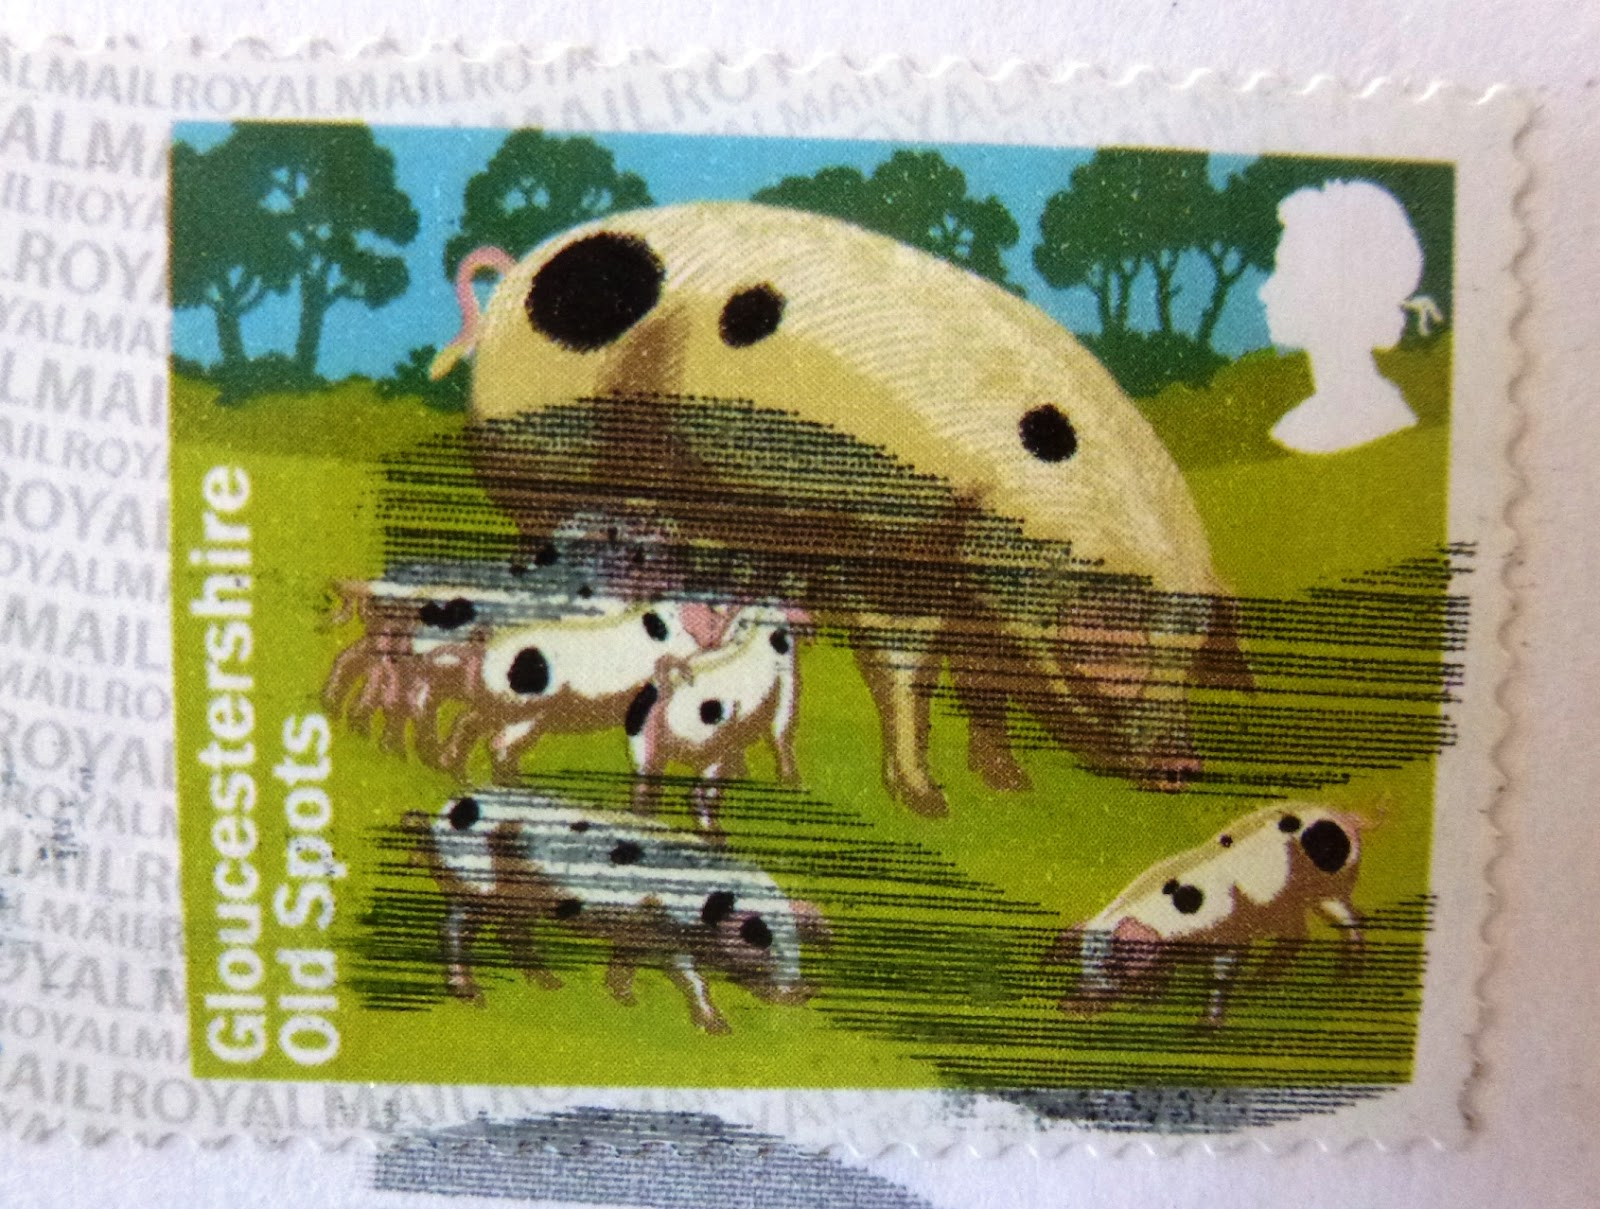 francobollo Royal Mail Glouchestershire Old Spots